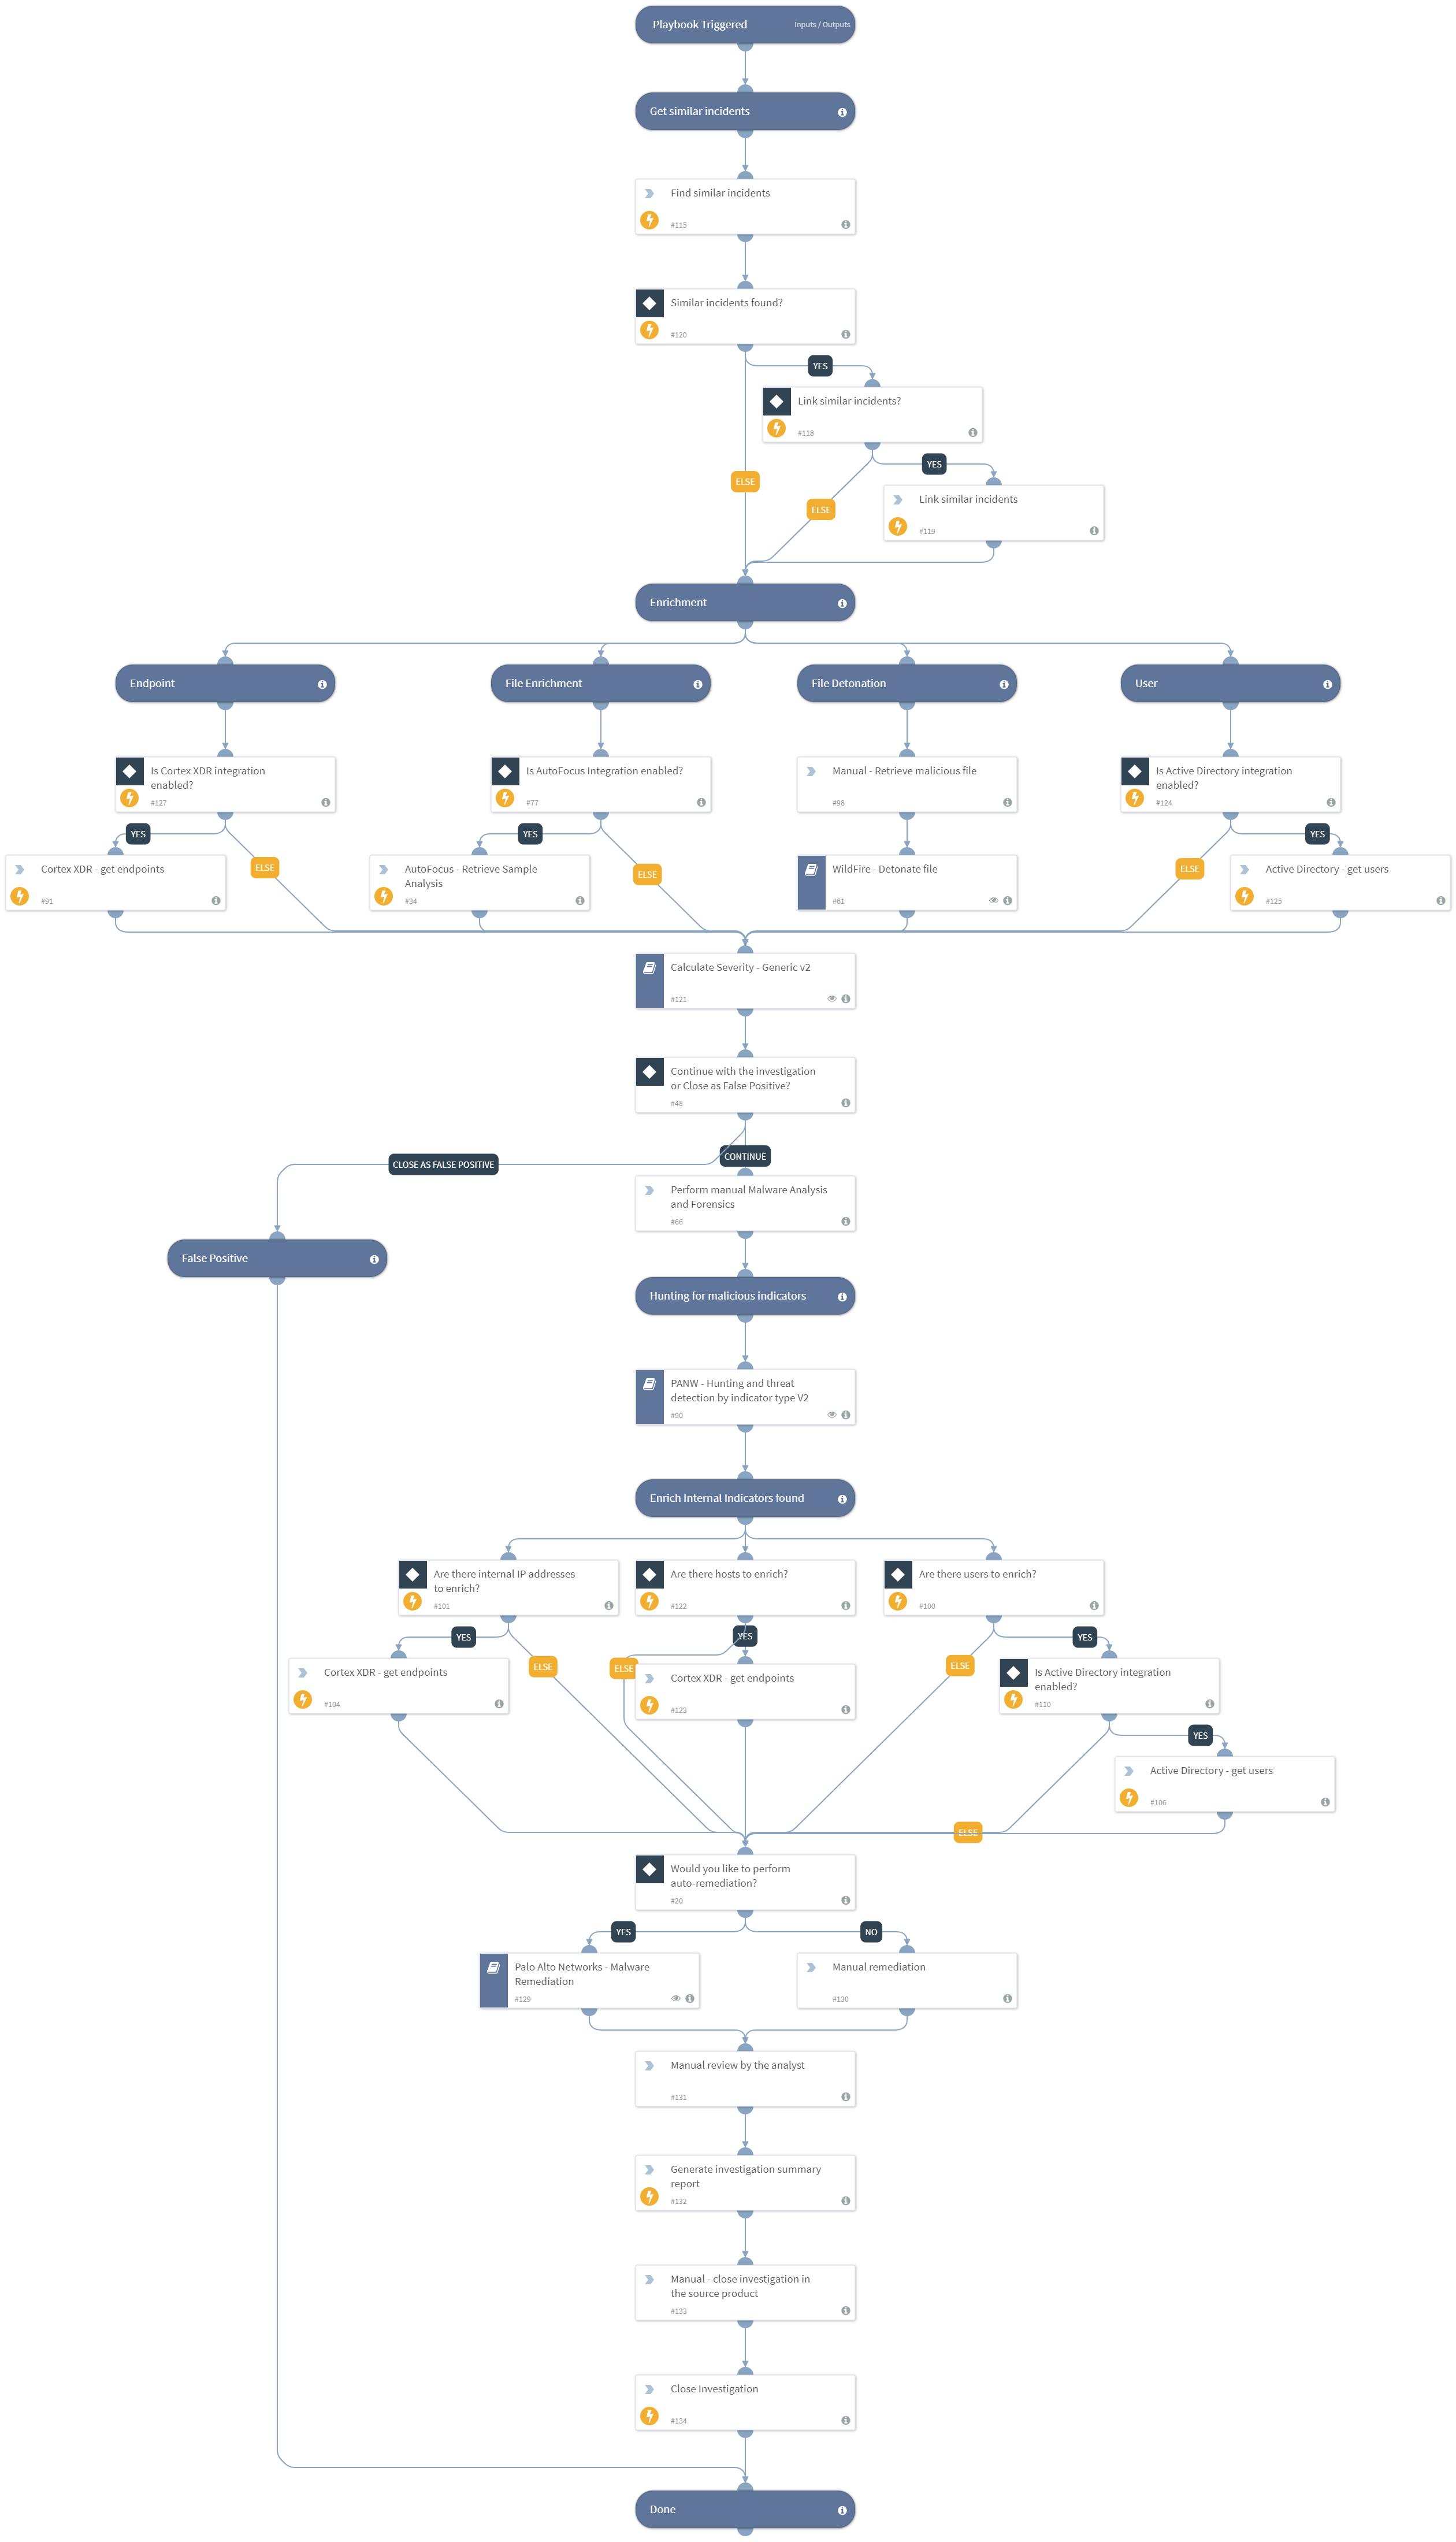 Palo Alto Networks - Endpoint Malware Investigation v2